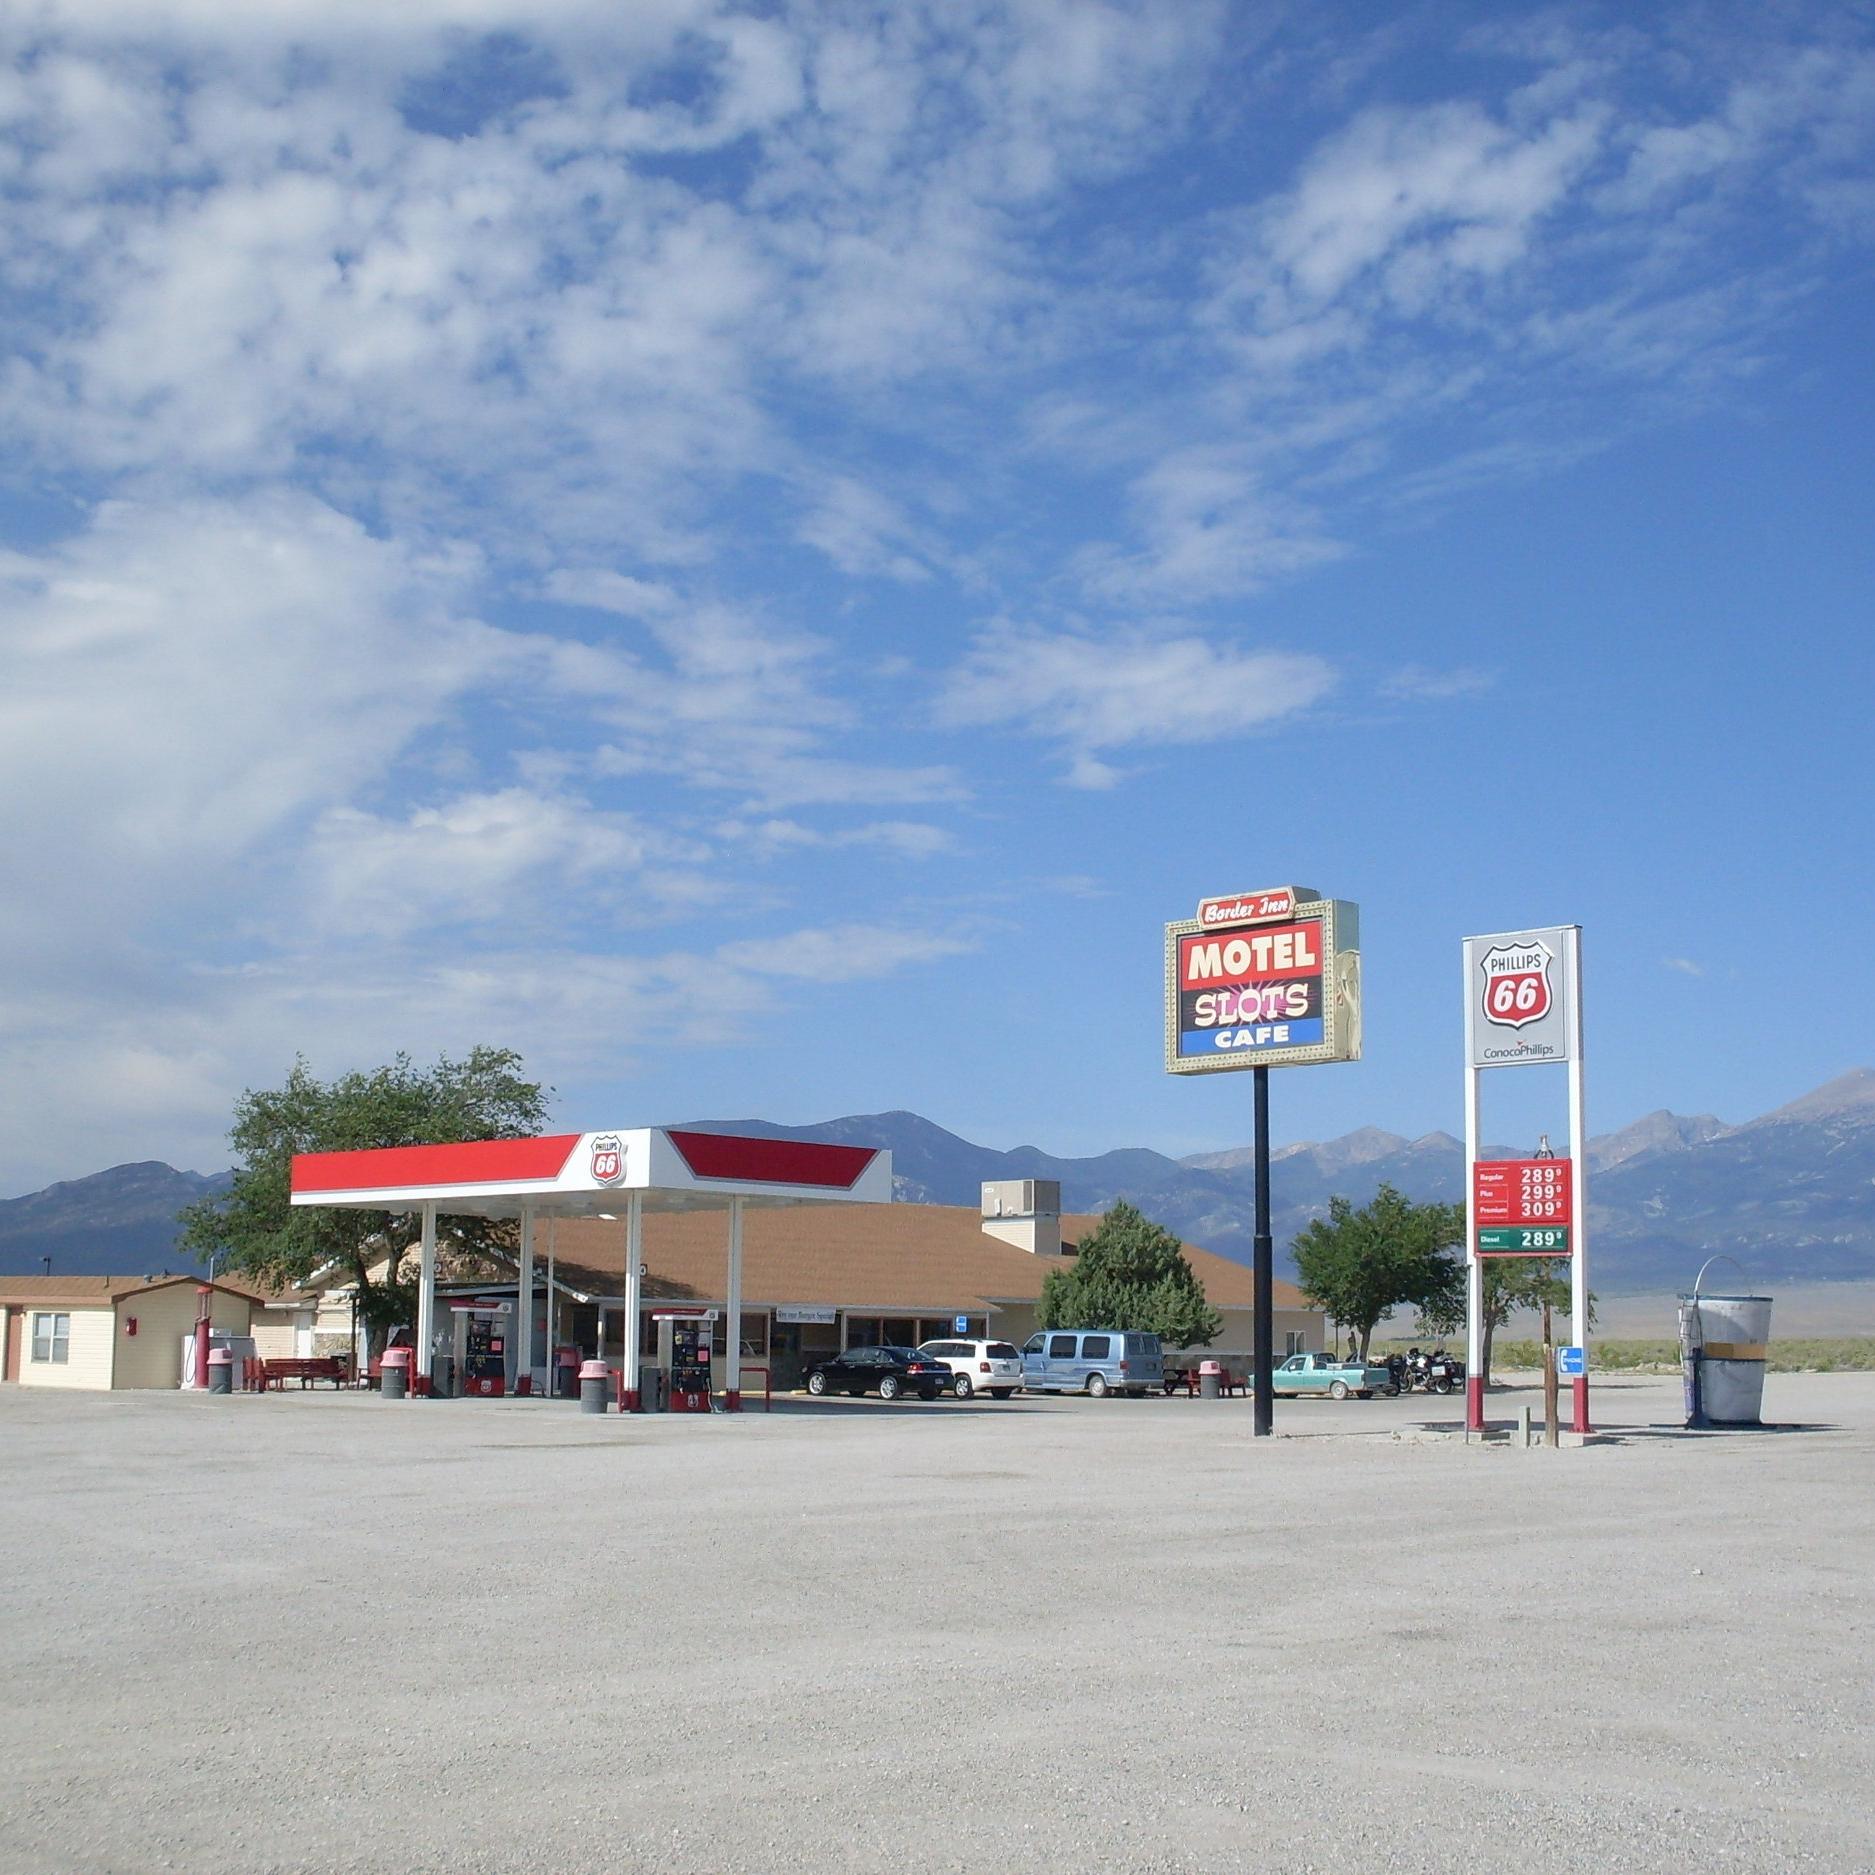 Restaurant & barconvenience store - Border inn casino